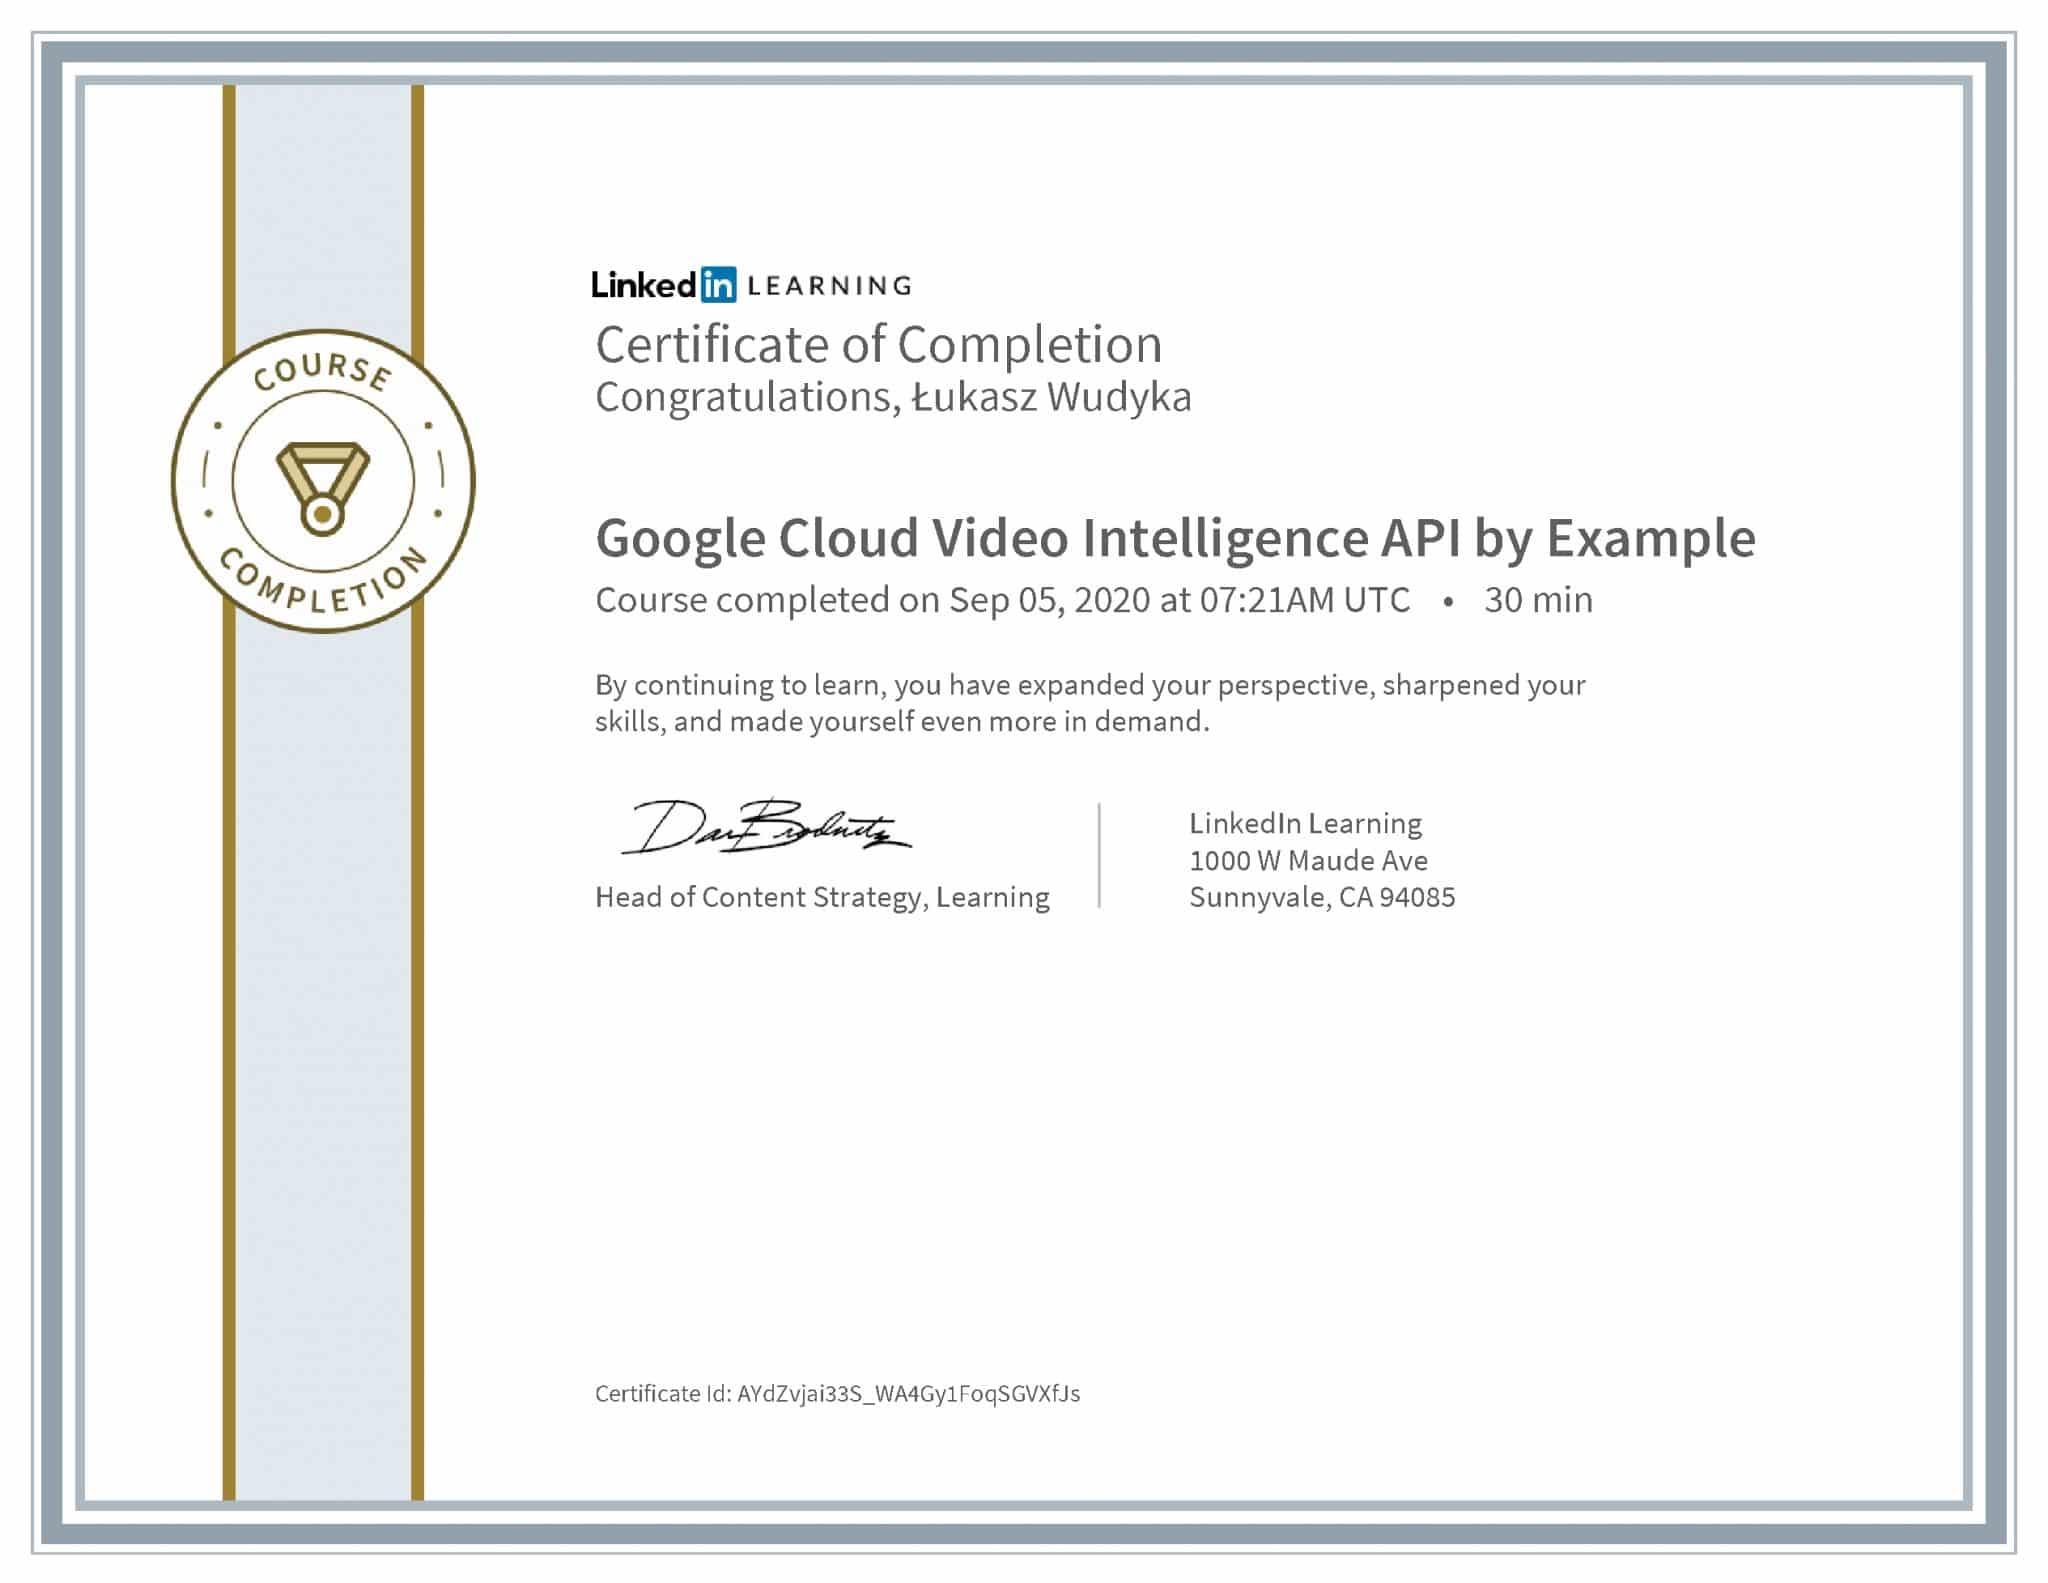 Łukasz Wudyka certyfikat LinkedIn Google Cloud Video Intelligence API by Example